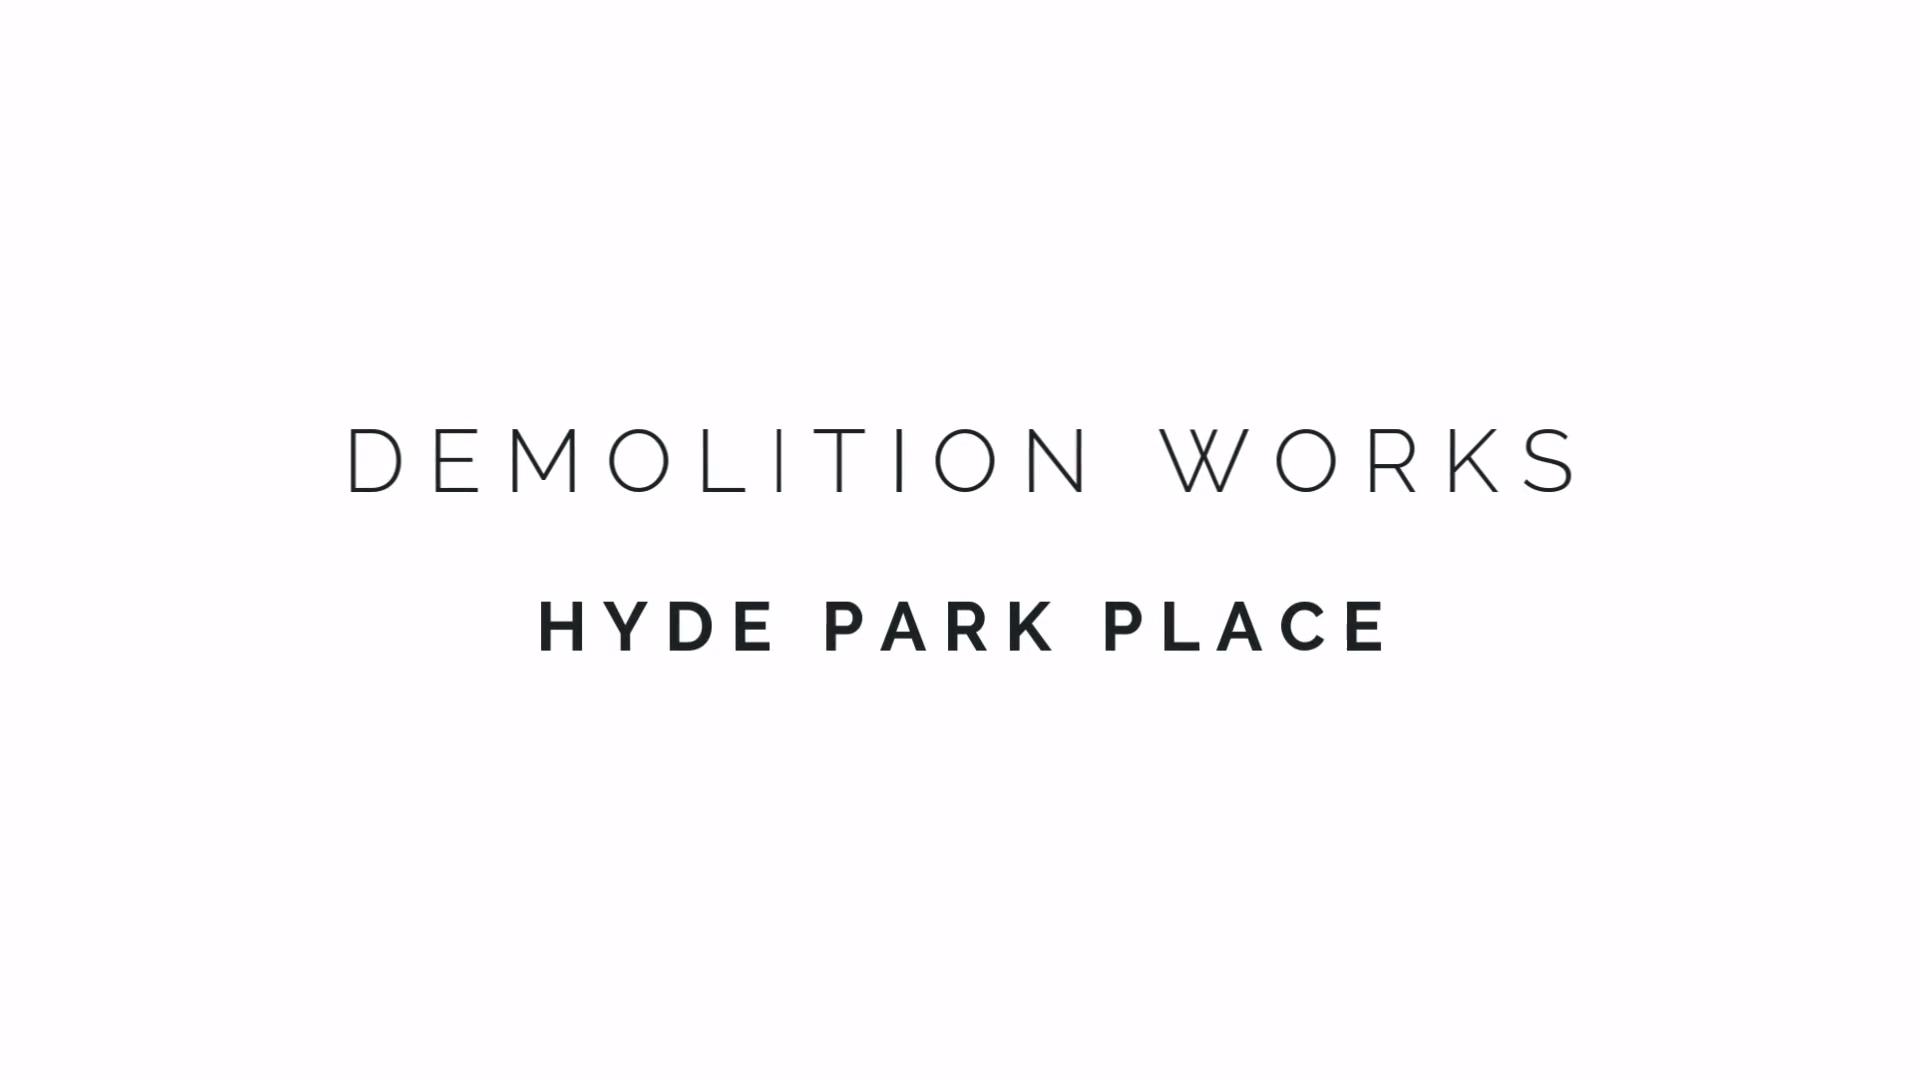 Hyde Park Place - Demolition Works, Sep 2019